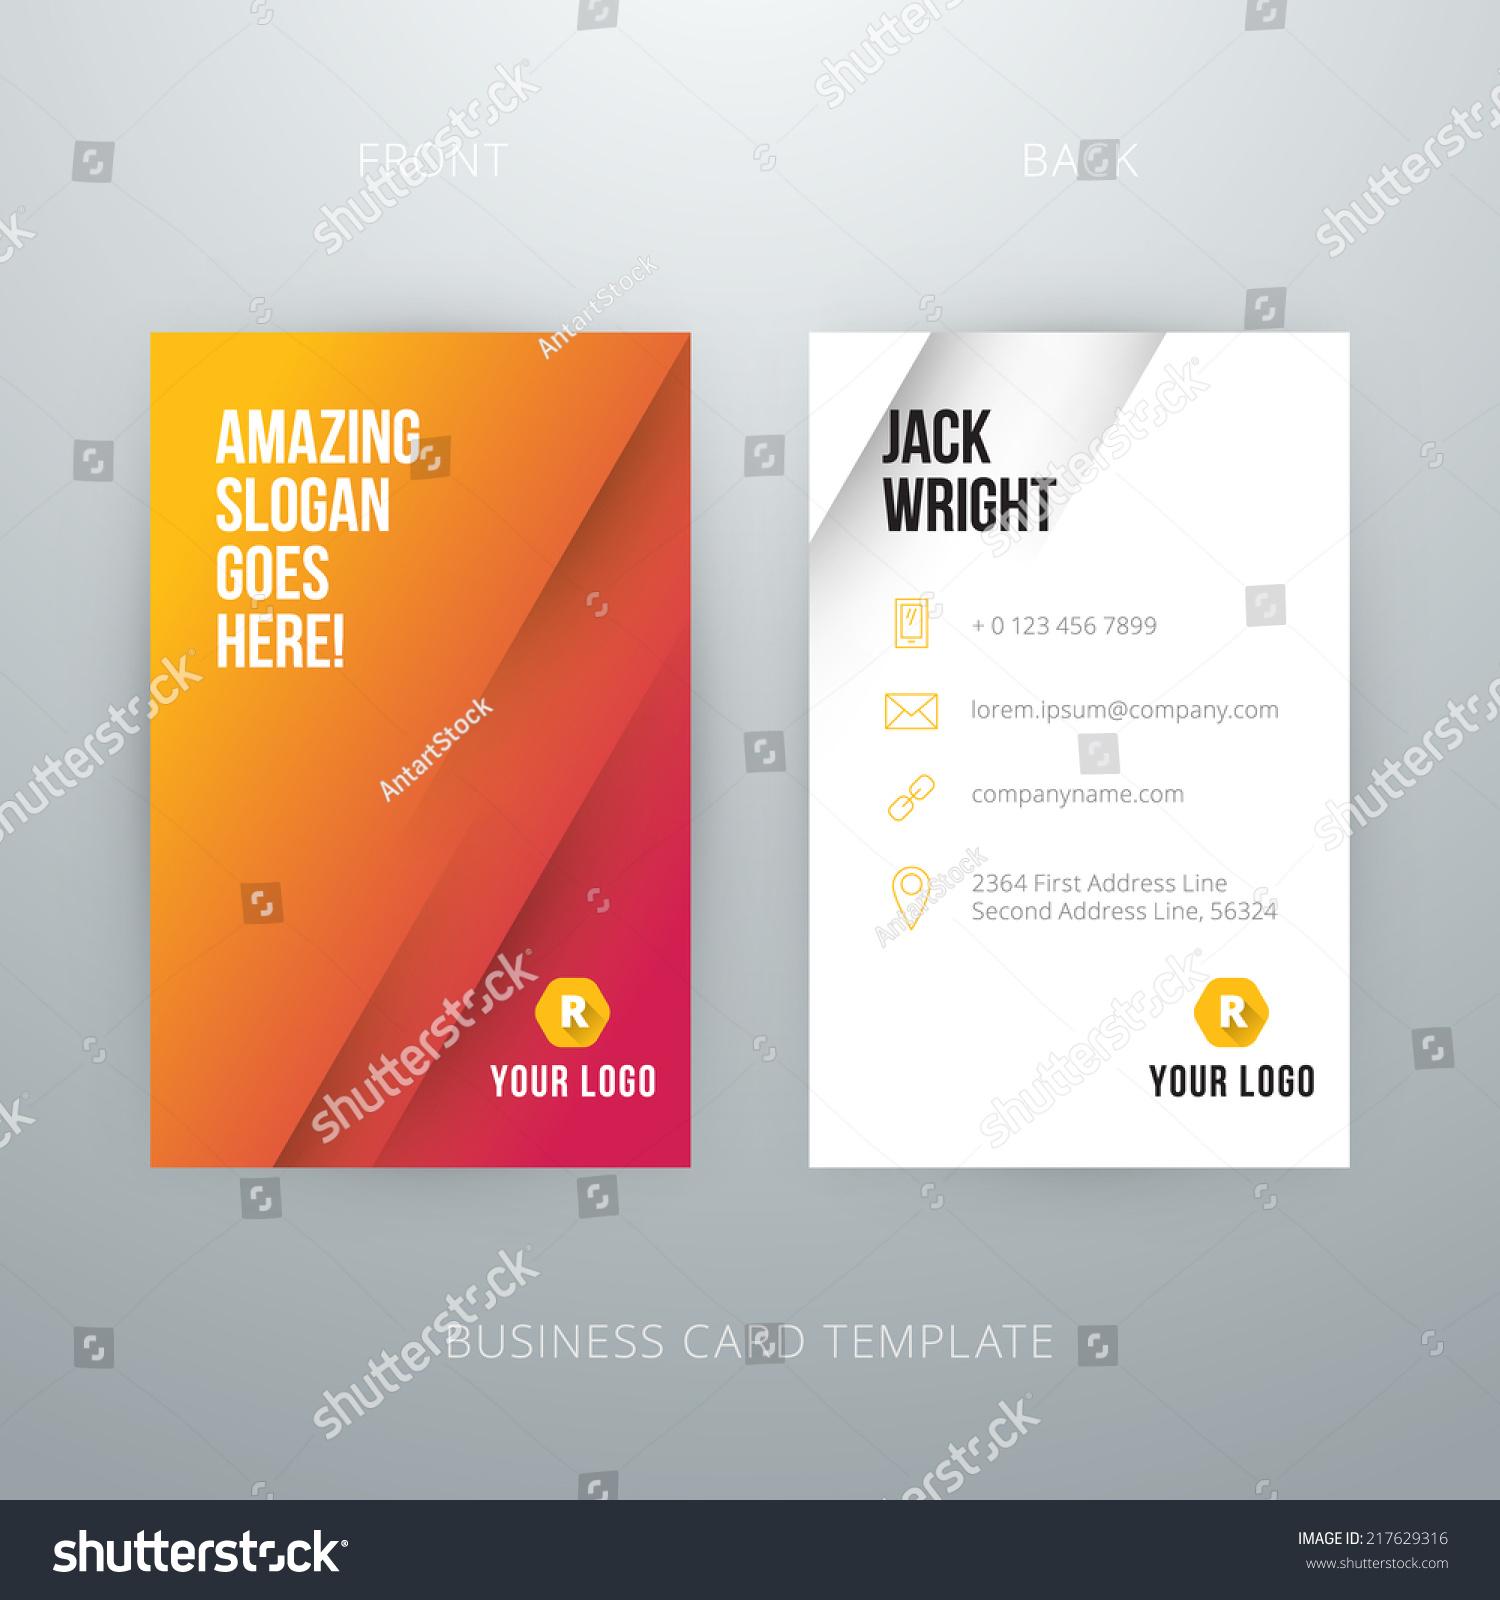 Modern Simple Business Card Template Vector Stock Vector 217629316 ...